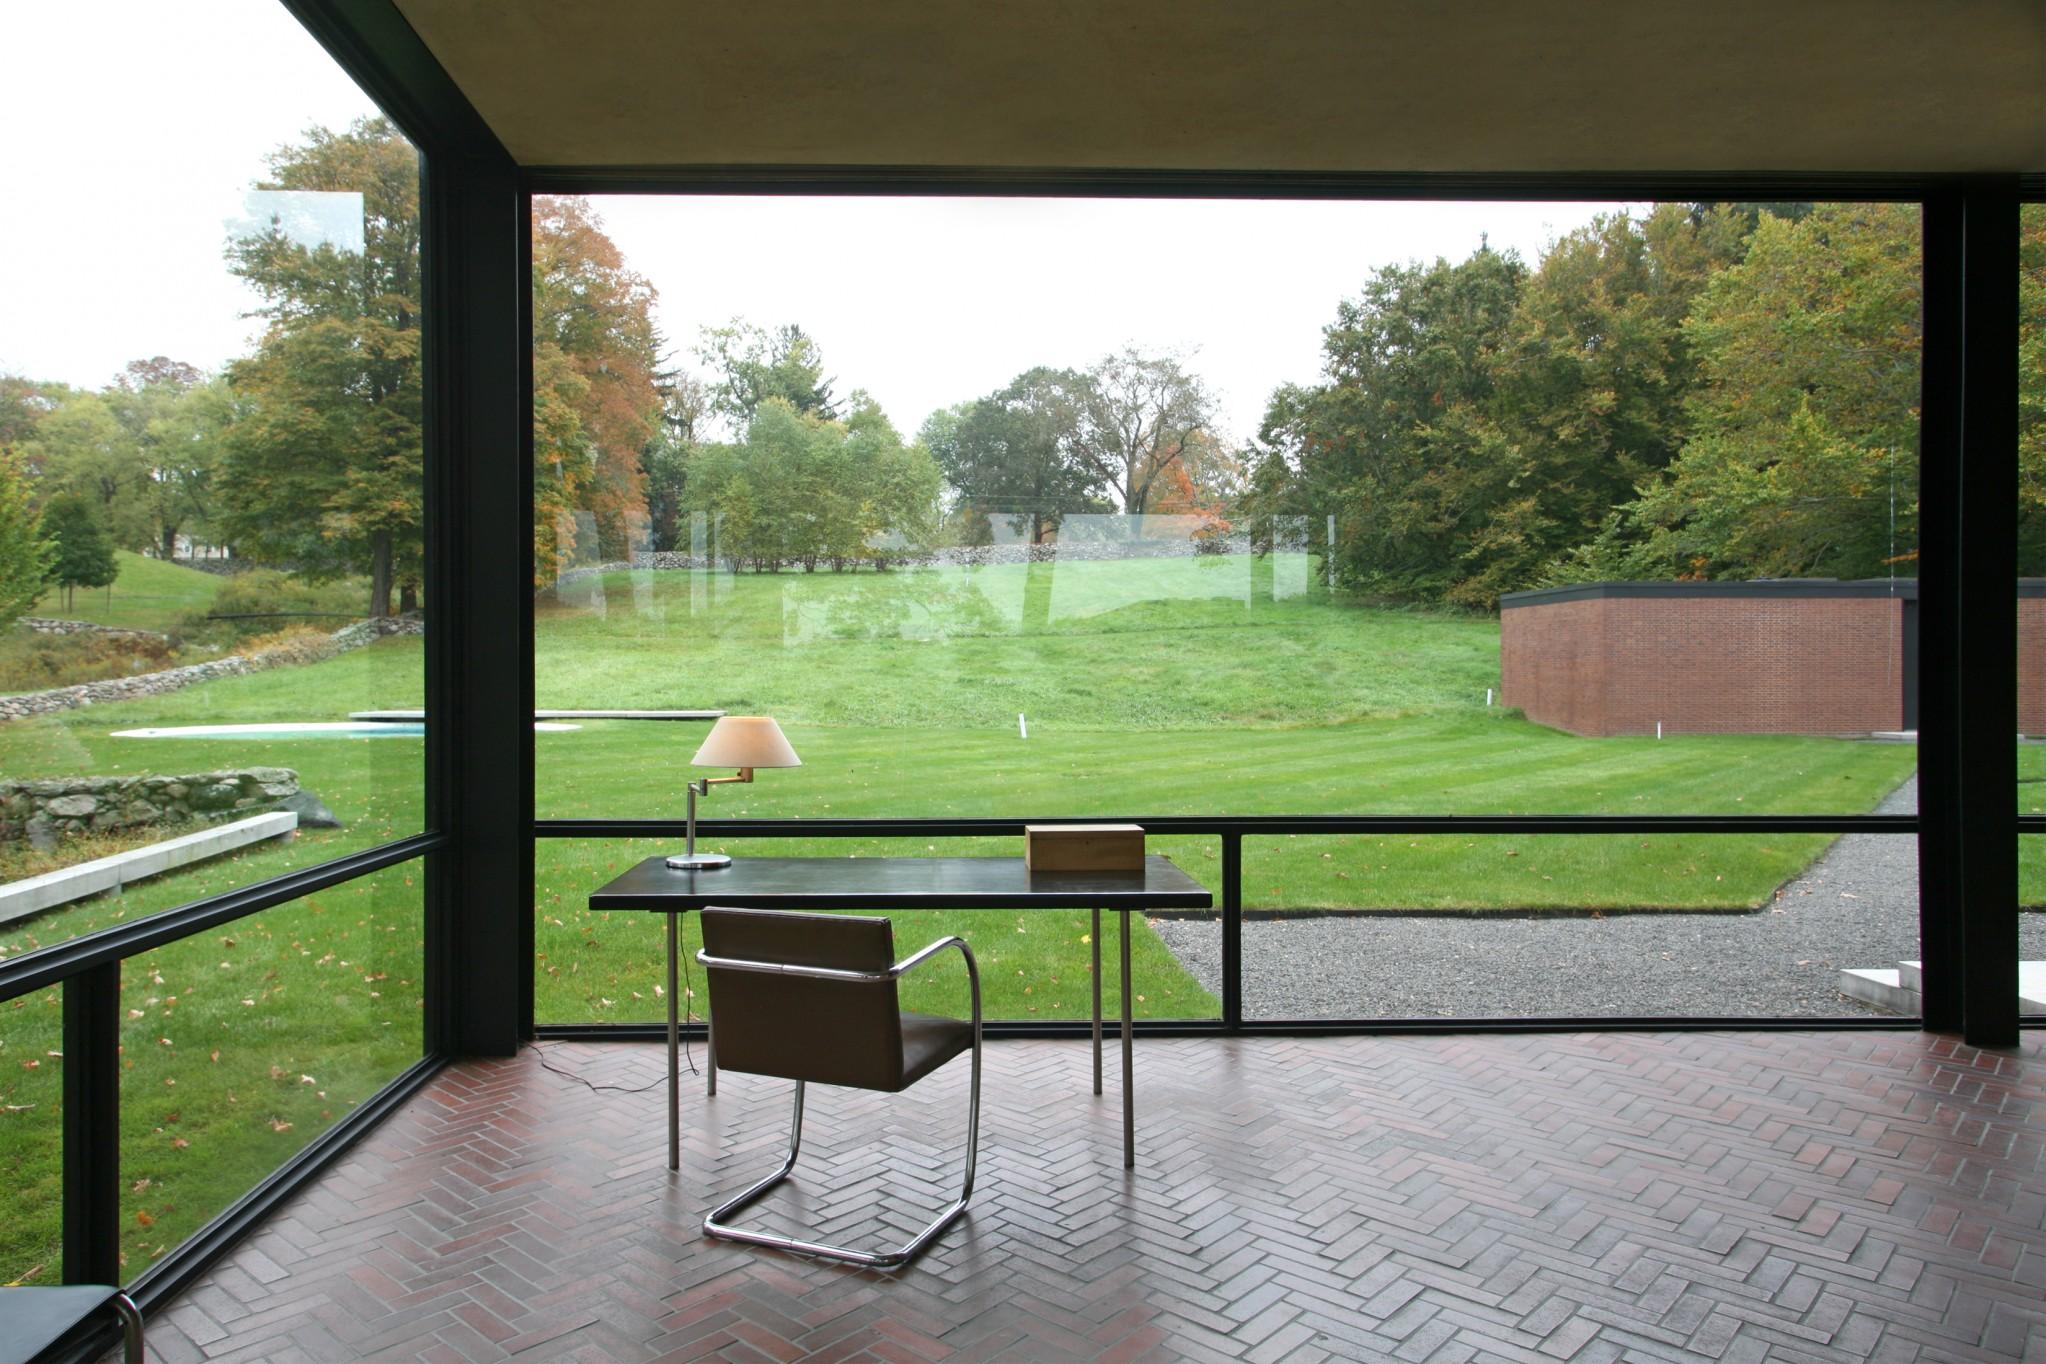 Philip Johnson Glass House an arcadian vision – glass visits philip johnson's glass